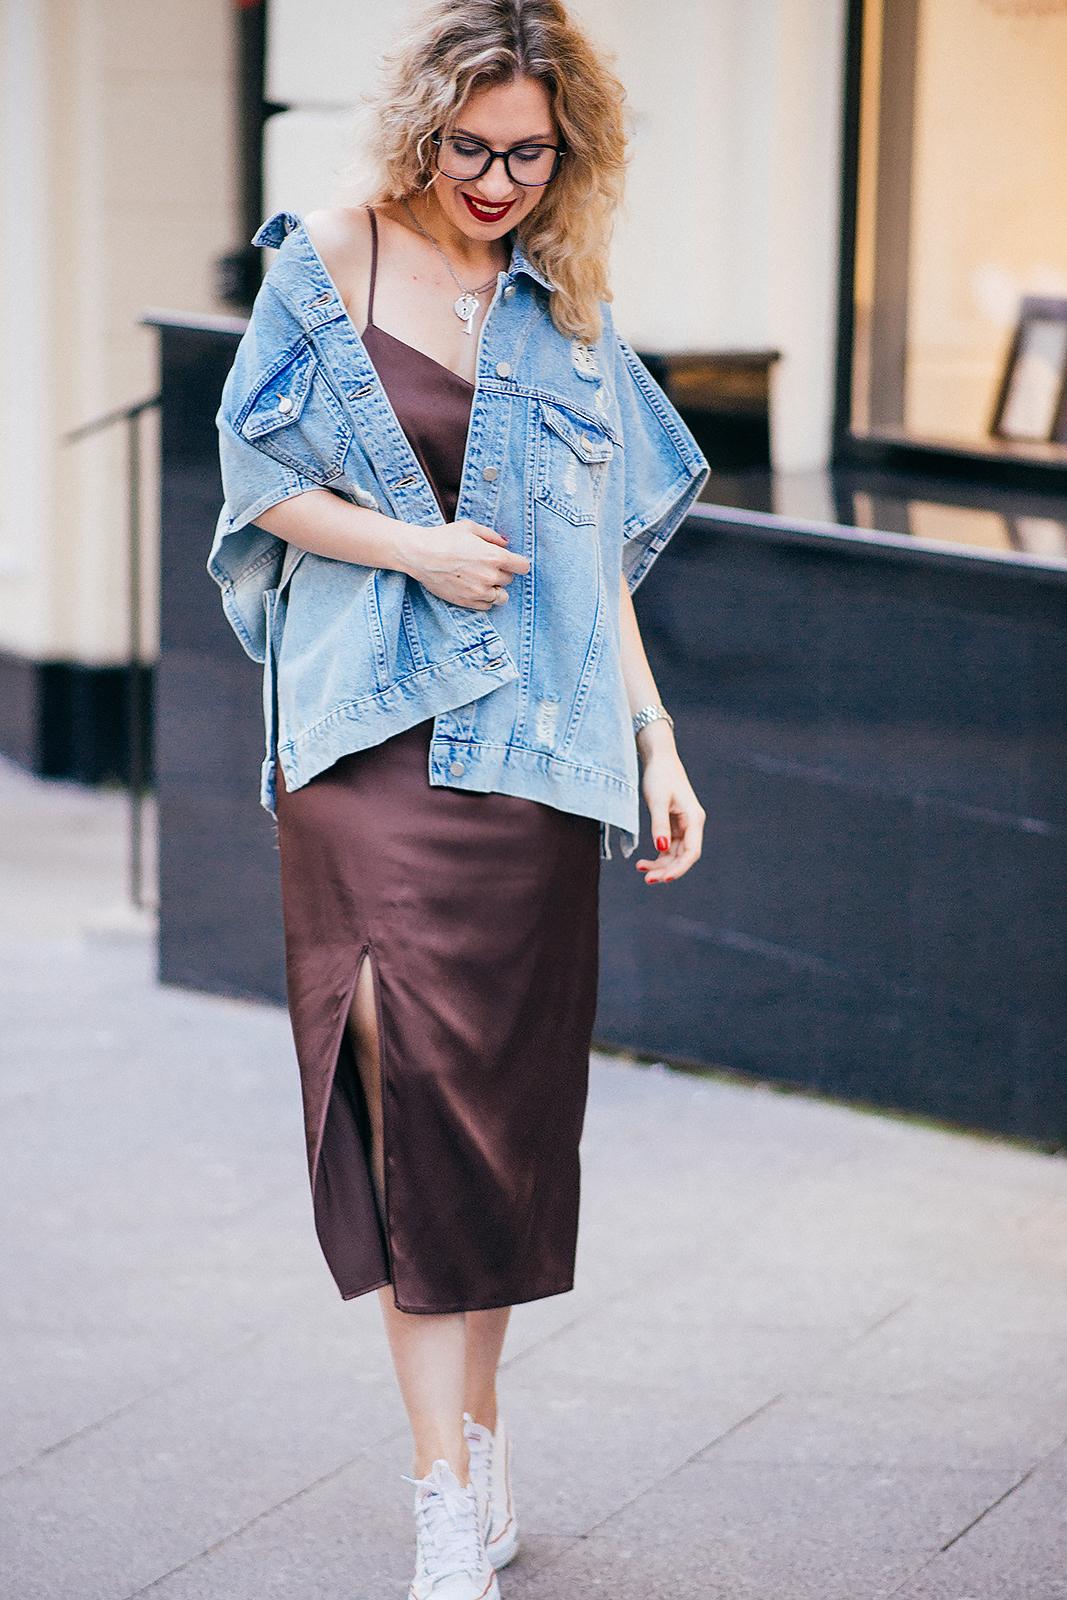 rita_maslova_fashion_blogger_ritalifestyle_denim_jacket_underwear_dress_glasses_red_lips_4